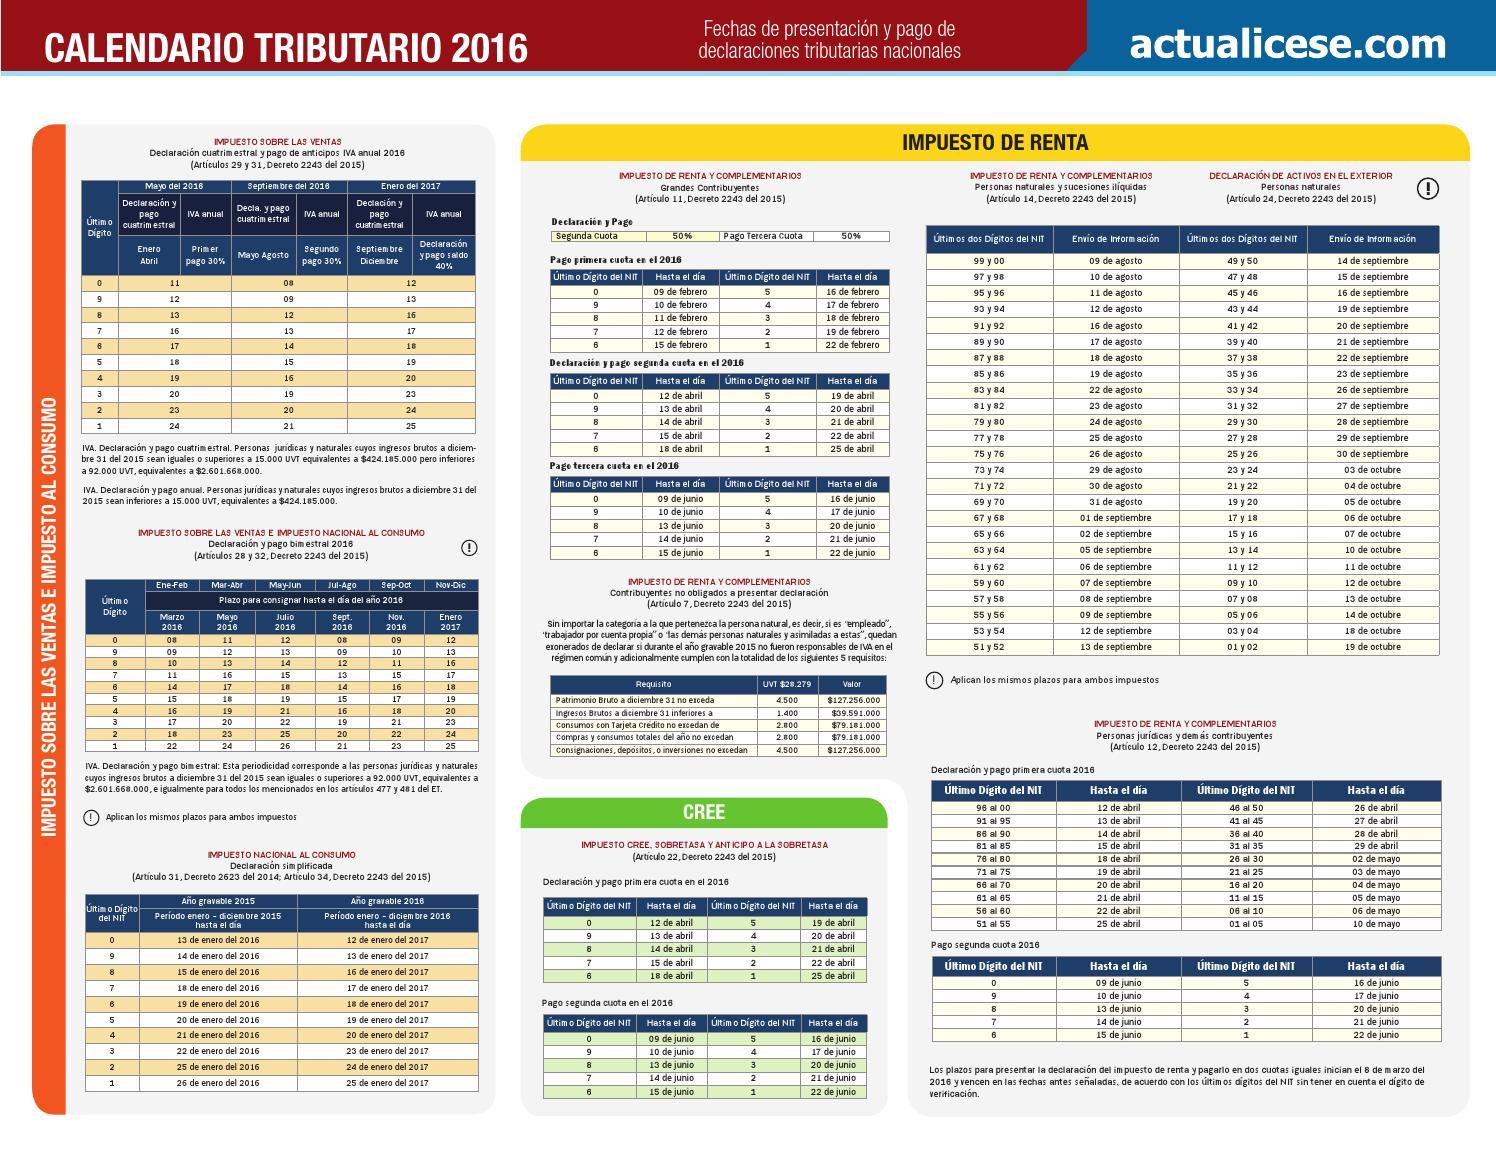 Calendario tributario 2016 regalo by CANAL LOPEZ SAS - issuu